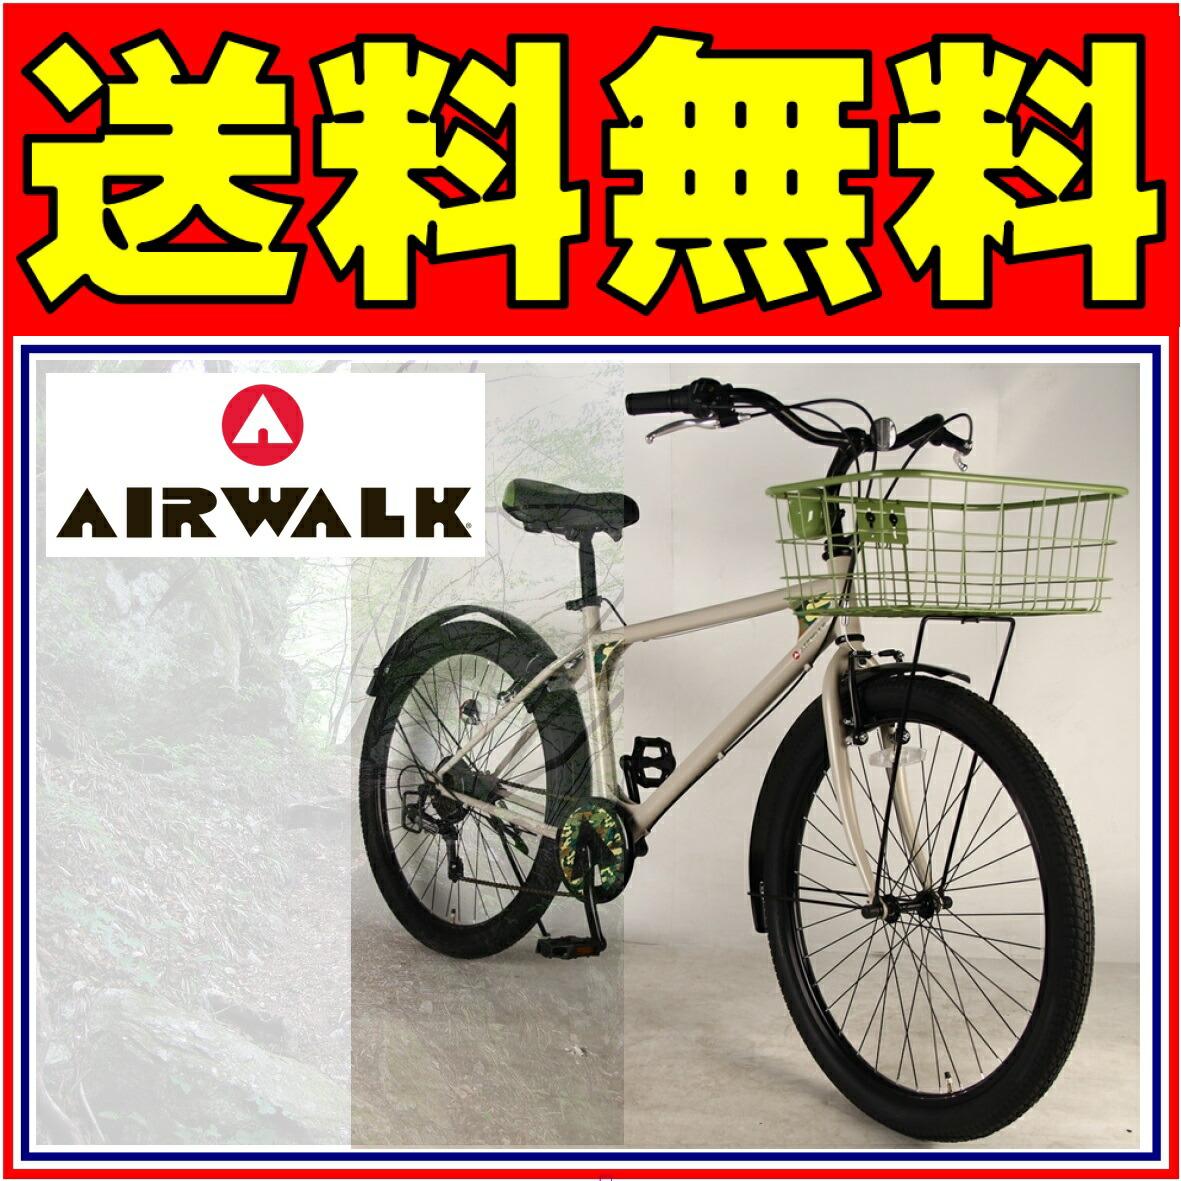 AIRWALK 自転車 ファットバイク カフェ/アイボリー 街乗りに最適 MTB/BMX 自転車 26インチ 外装6段 AIRWALK エアーウォーク 自転車 ファットバイク